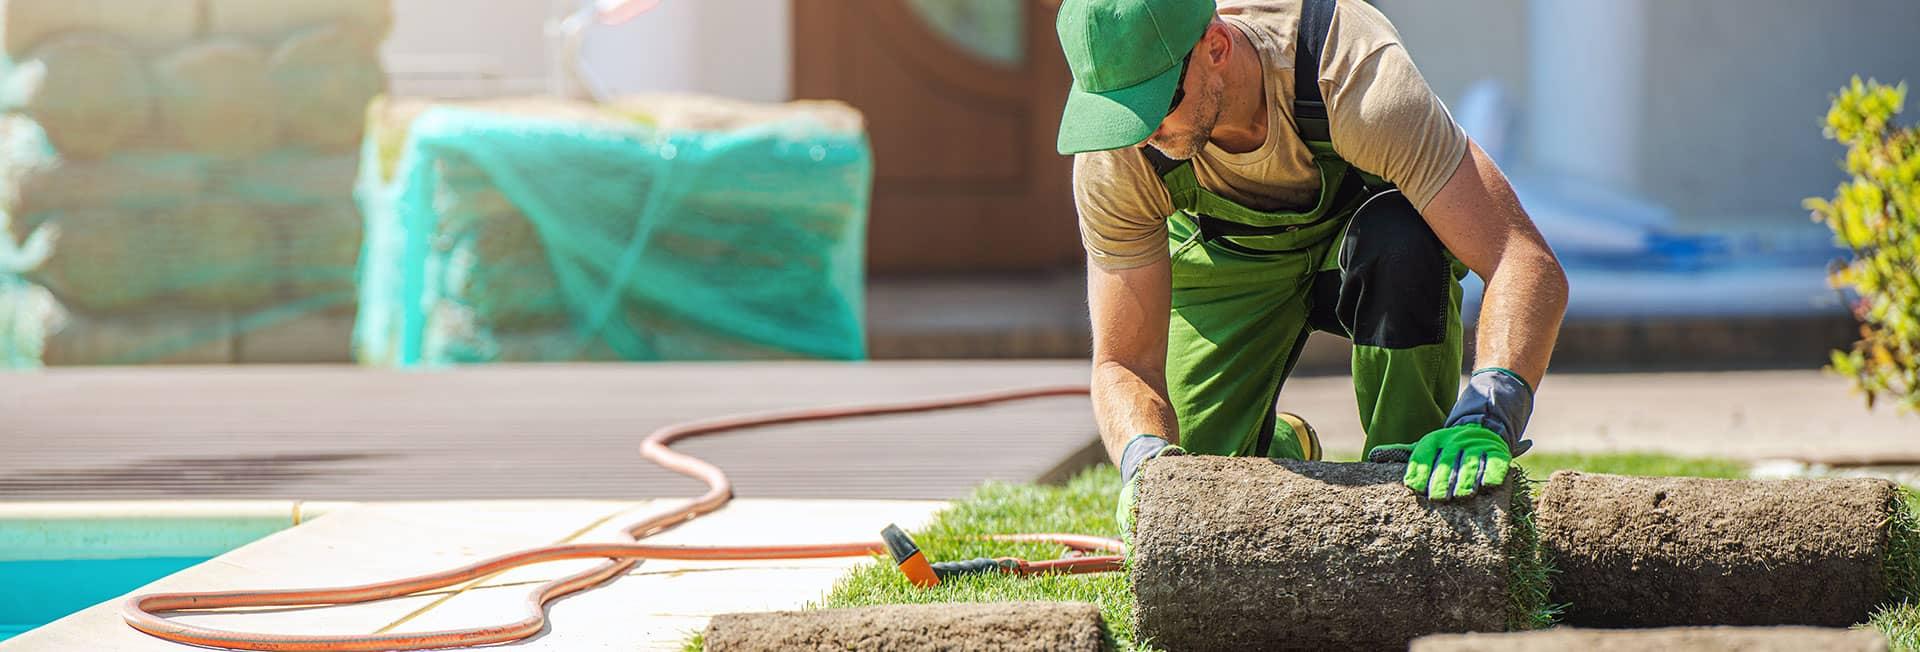 residential-installation-services.jpg